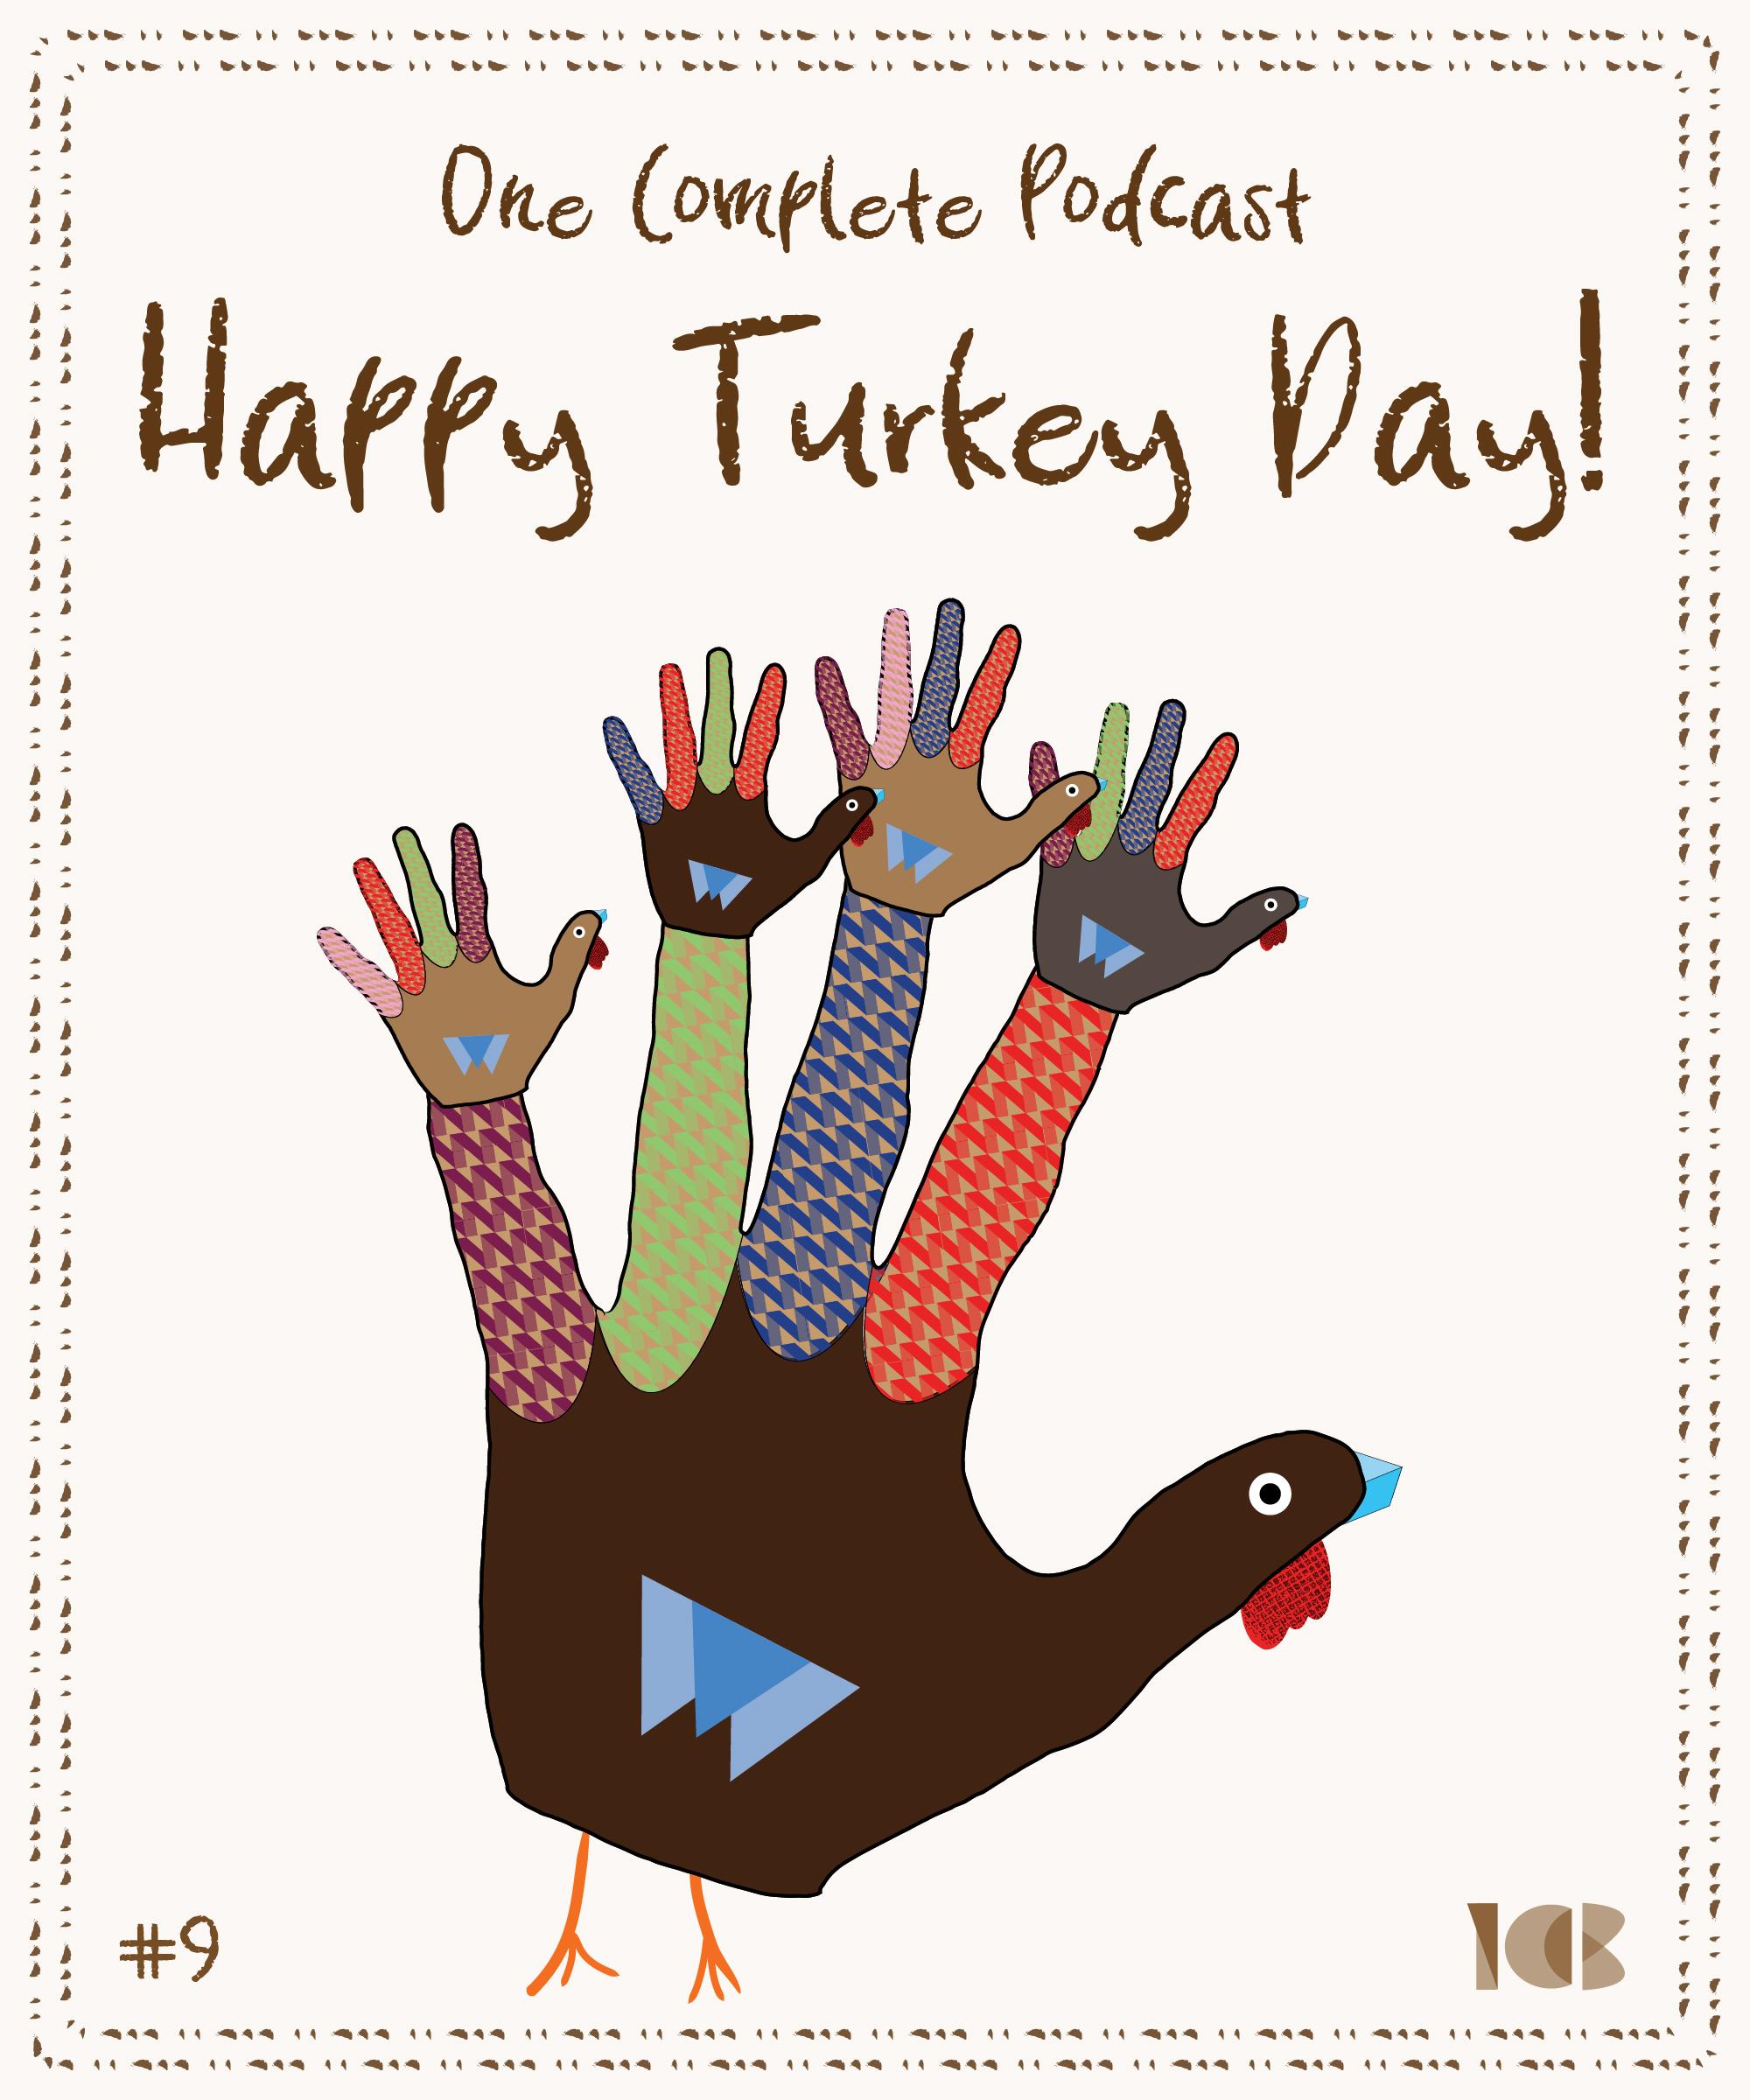 Hand Turkey V2.jpg